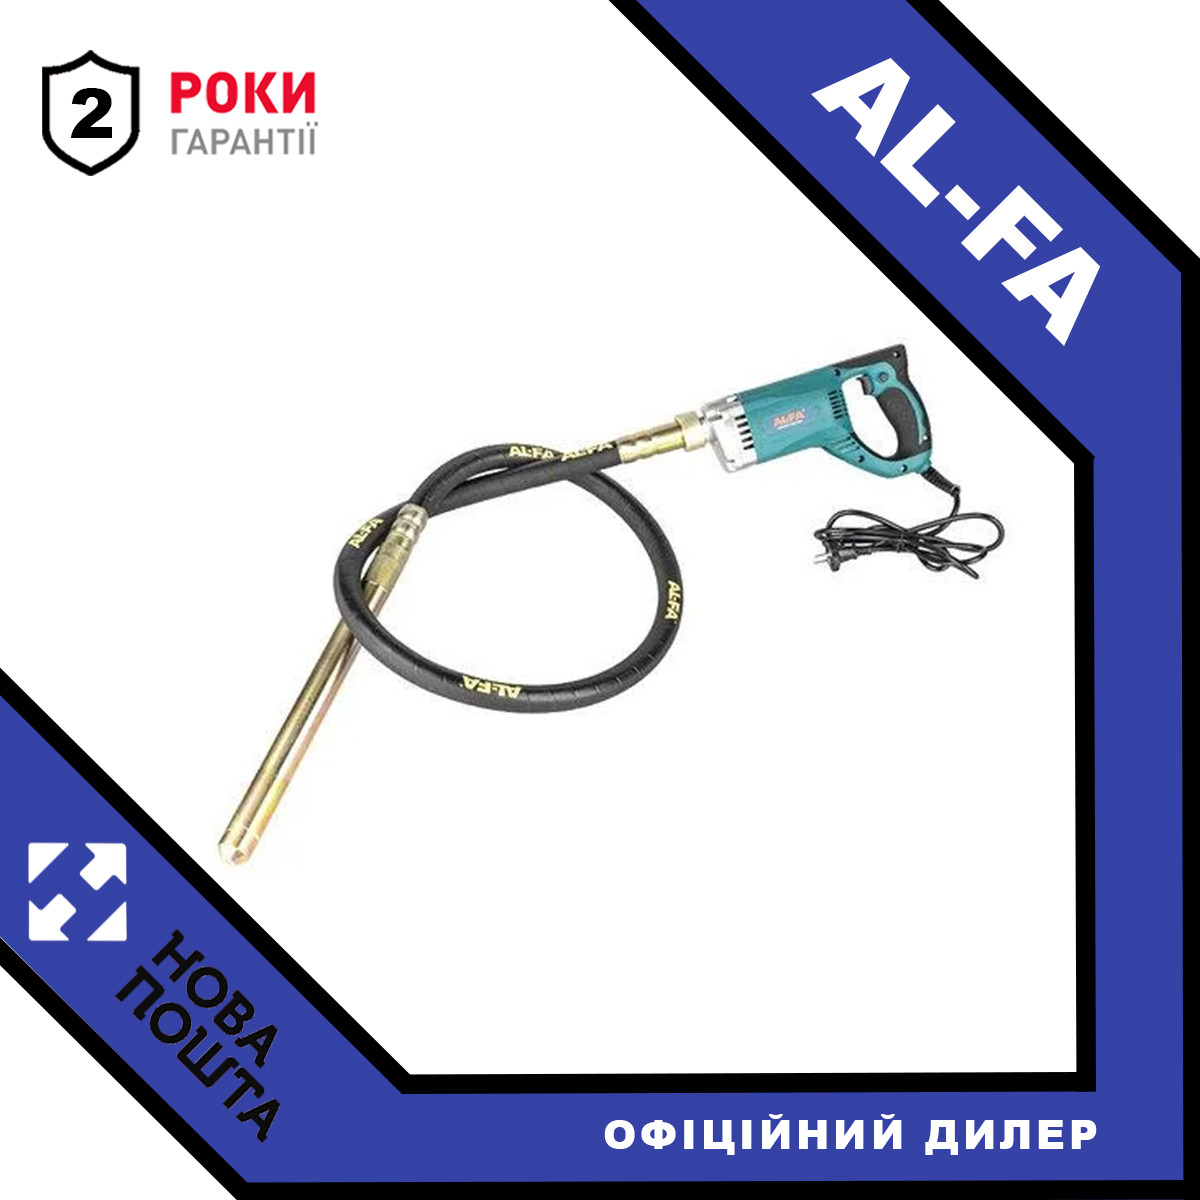 Глубинный вибратор для бетона AL-FA ALID-216 / Диаметр булавы: 35 мм (4000об / мин 2000Вт)